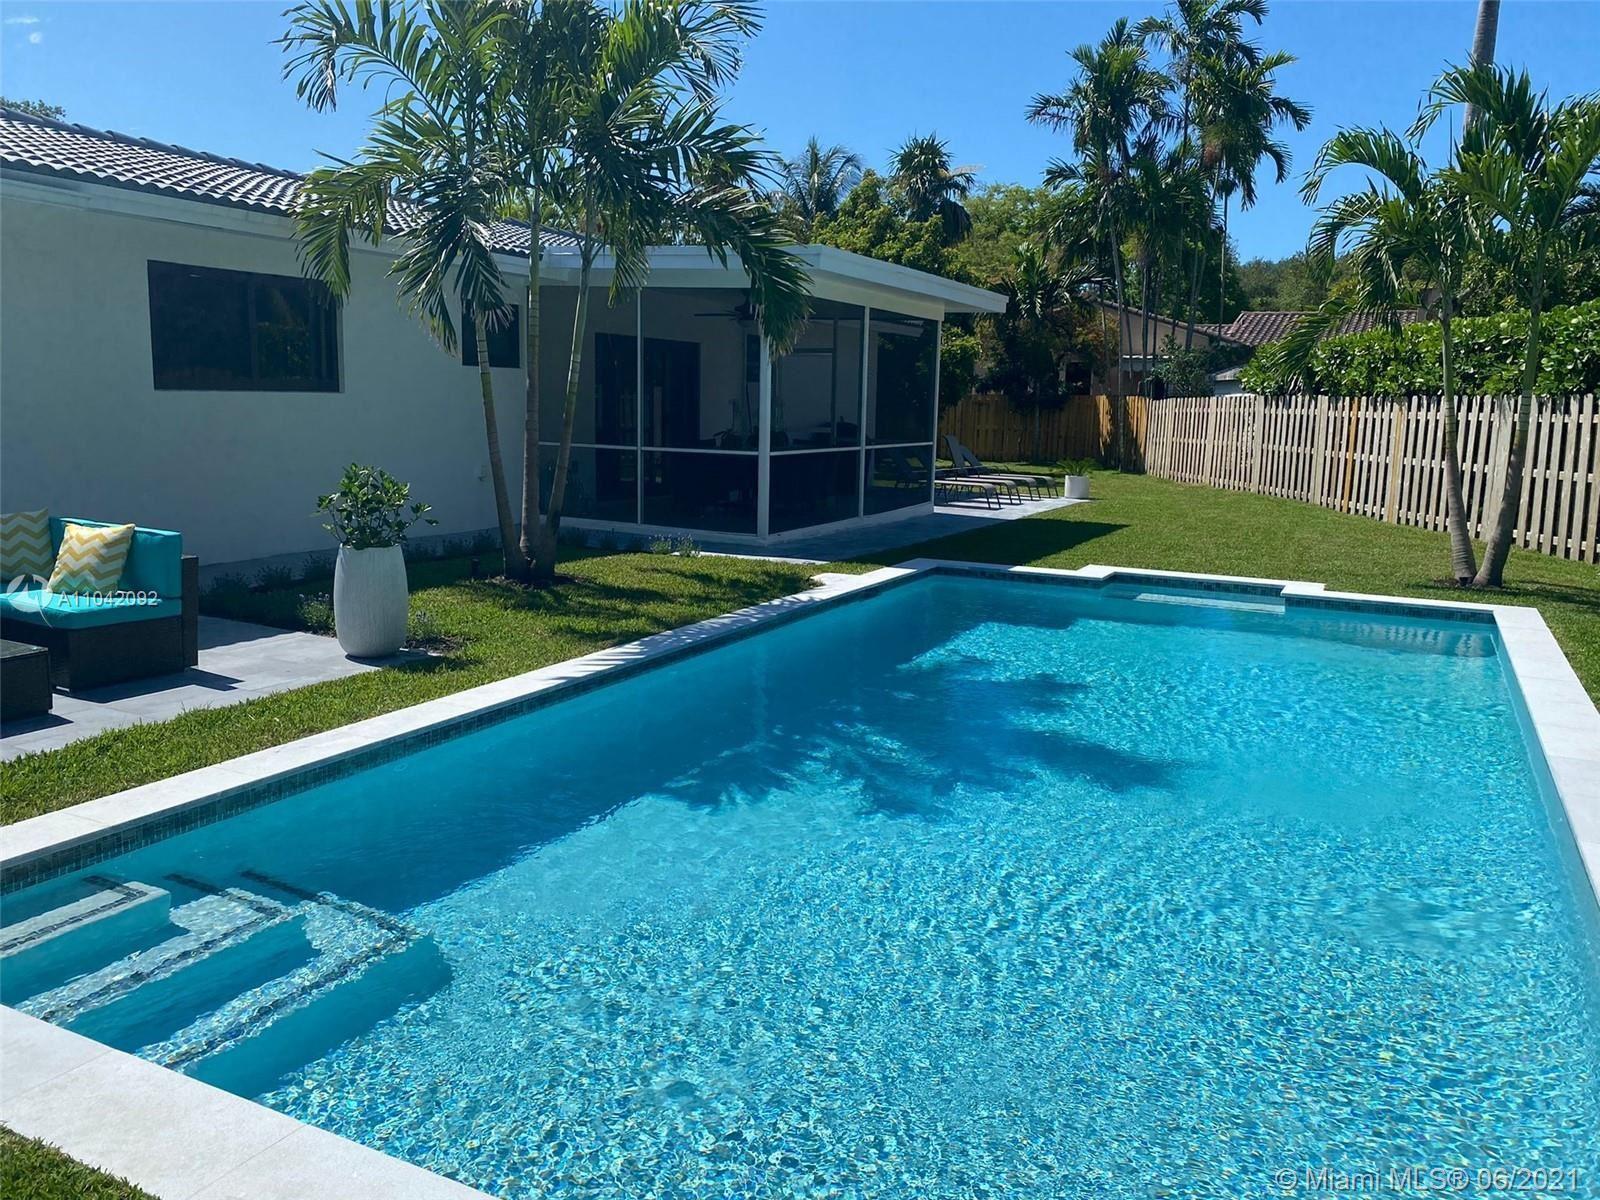 11504 NE 6th Ave, Biscayne Park, FL 33161 - #: A11042092